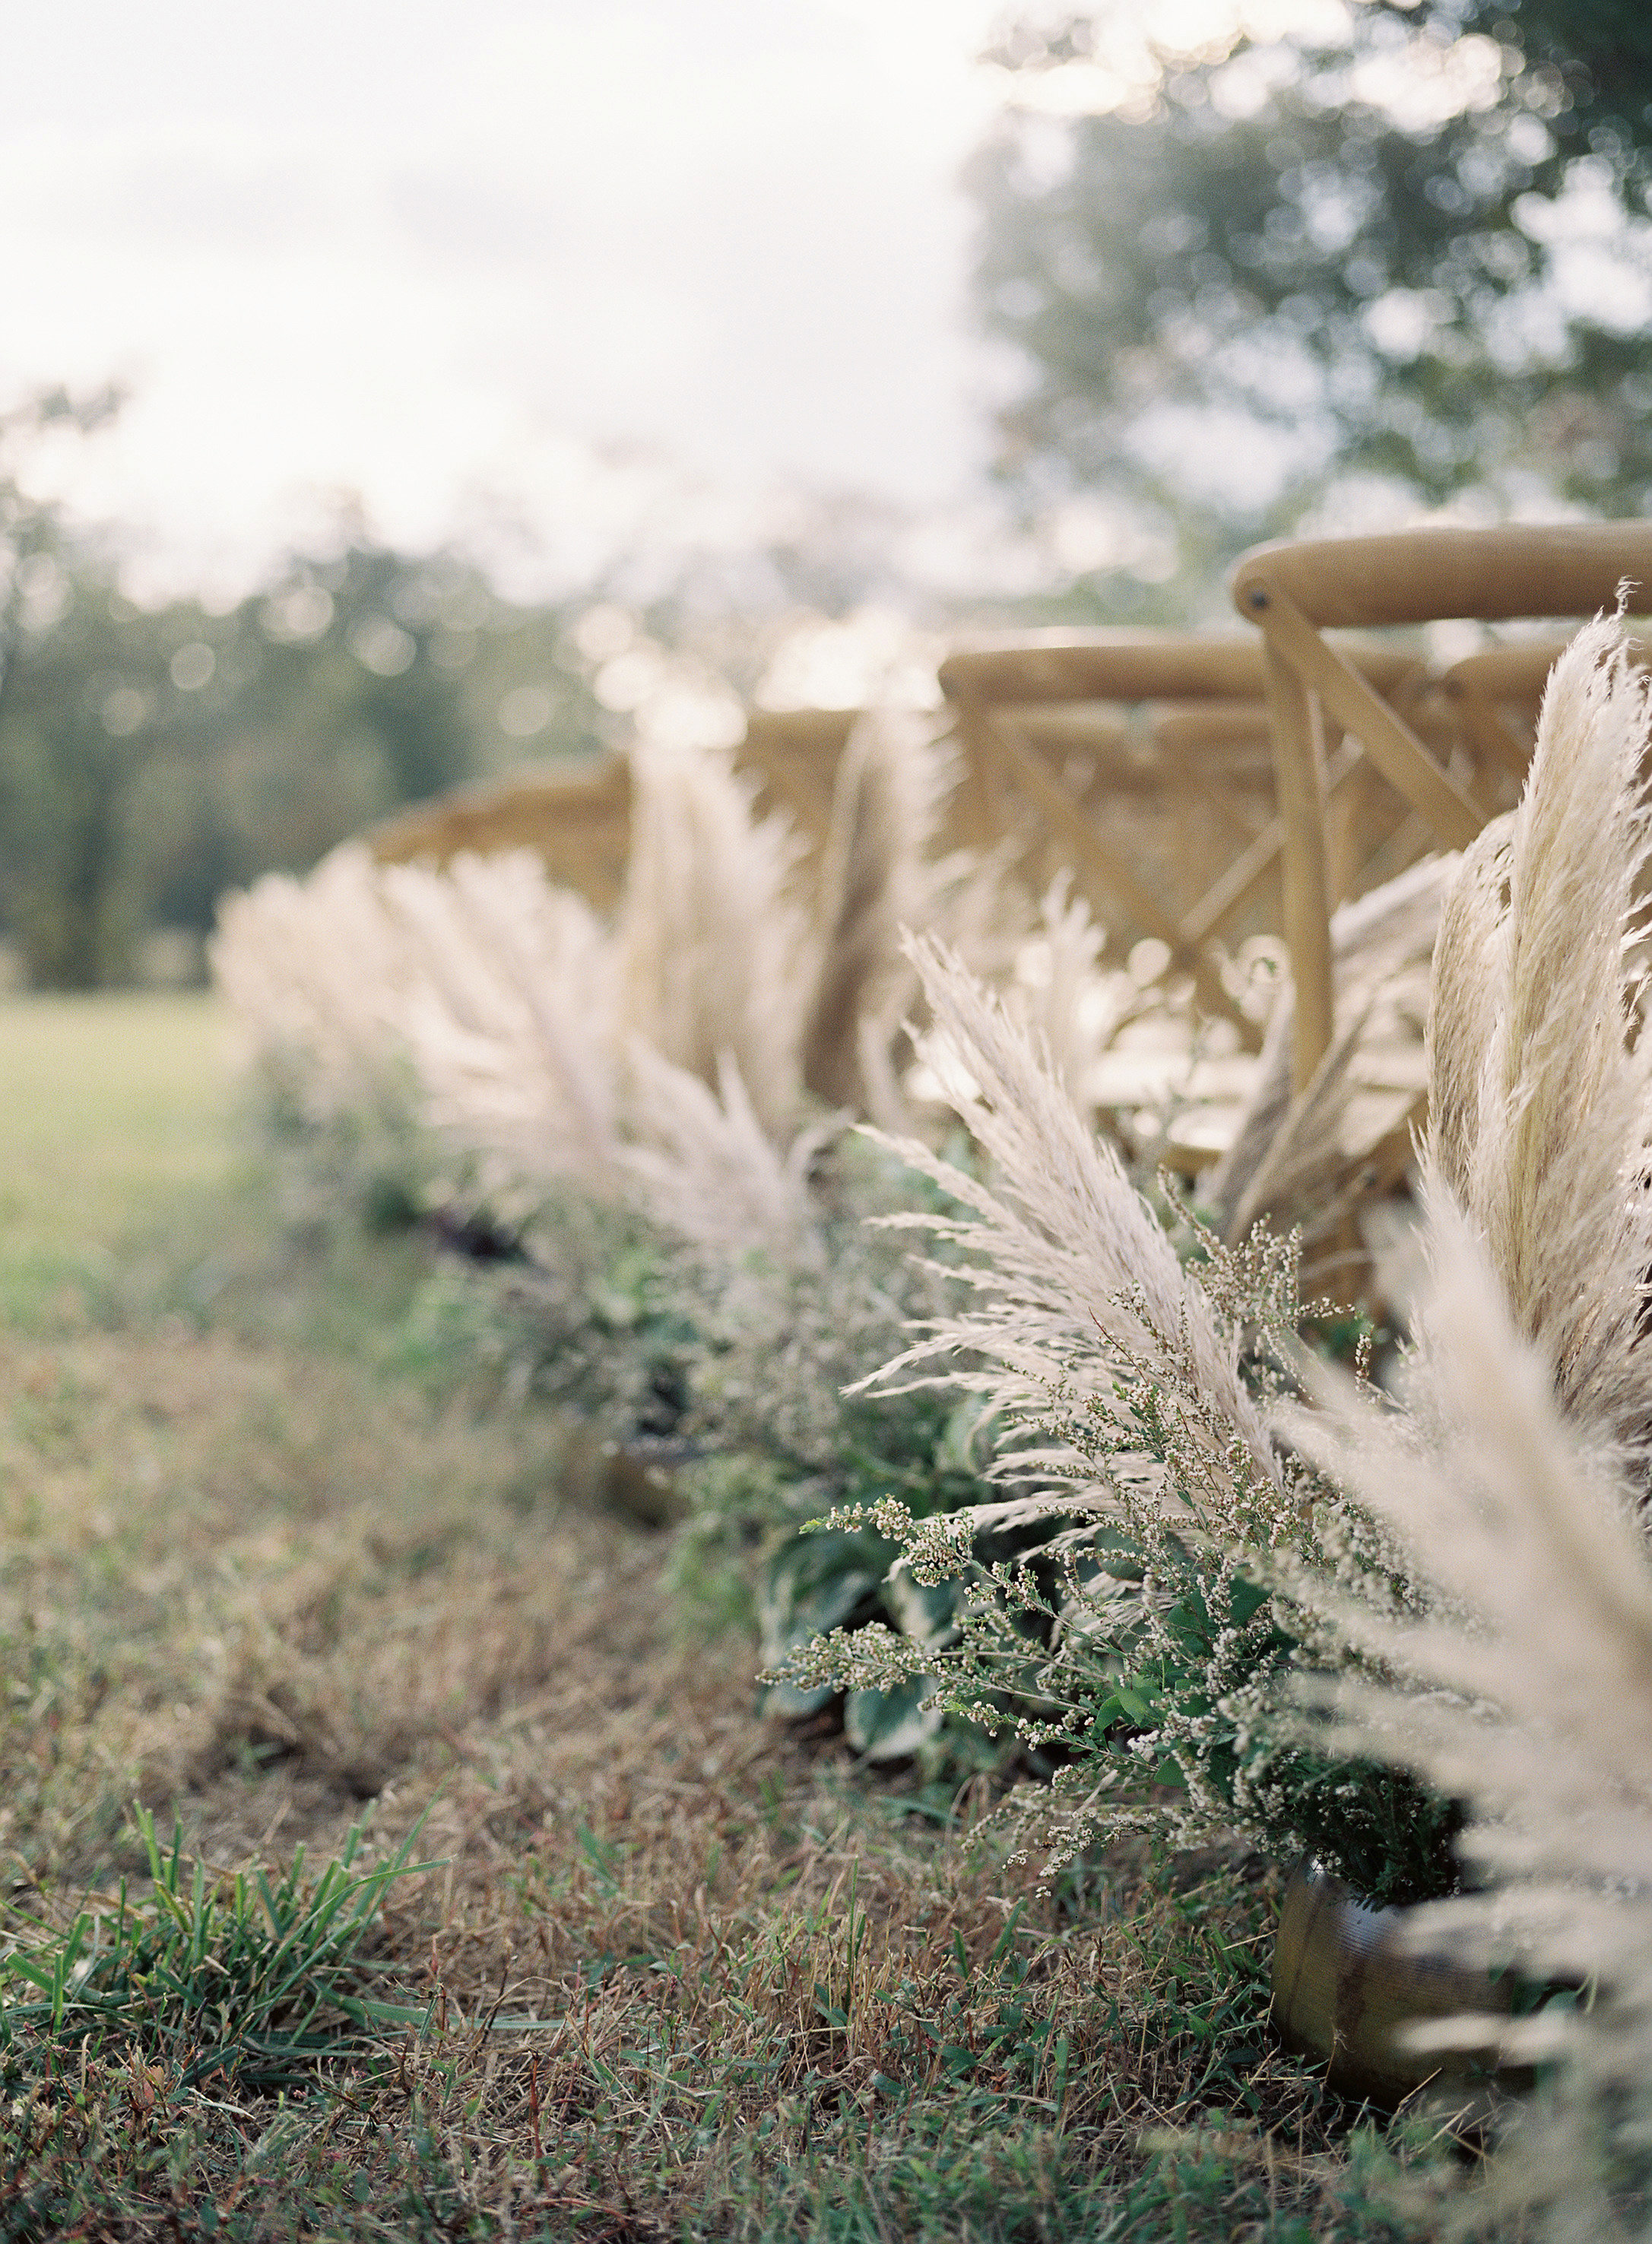 jessica-zimmerman-events-heather-payne-dan-and-shay-wedding-ceremony.jpg